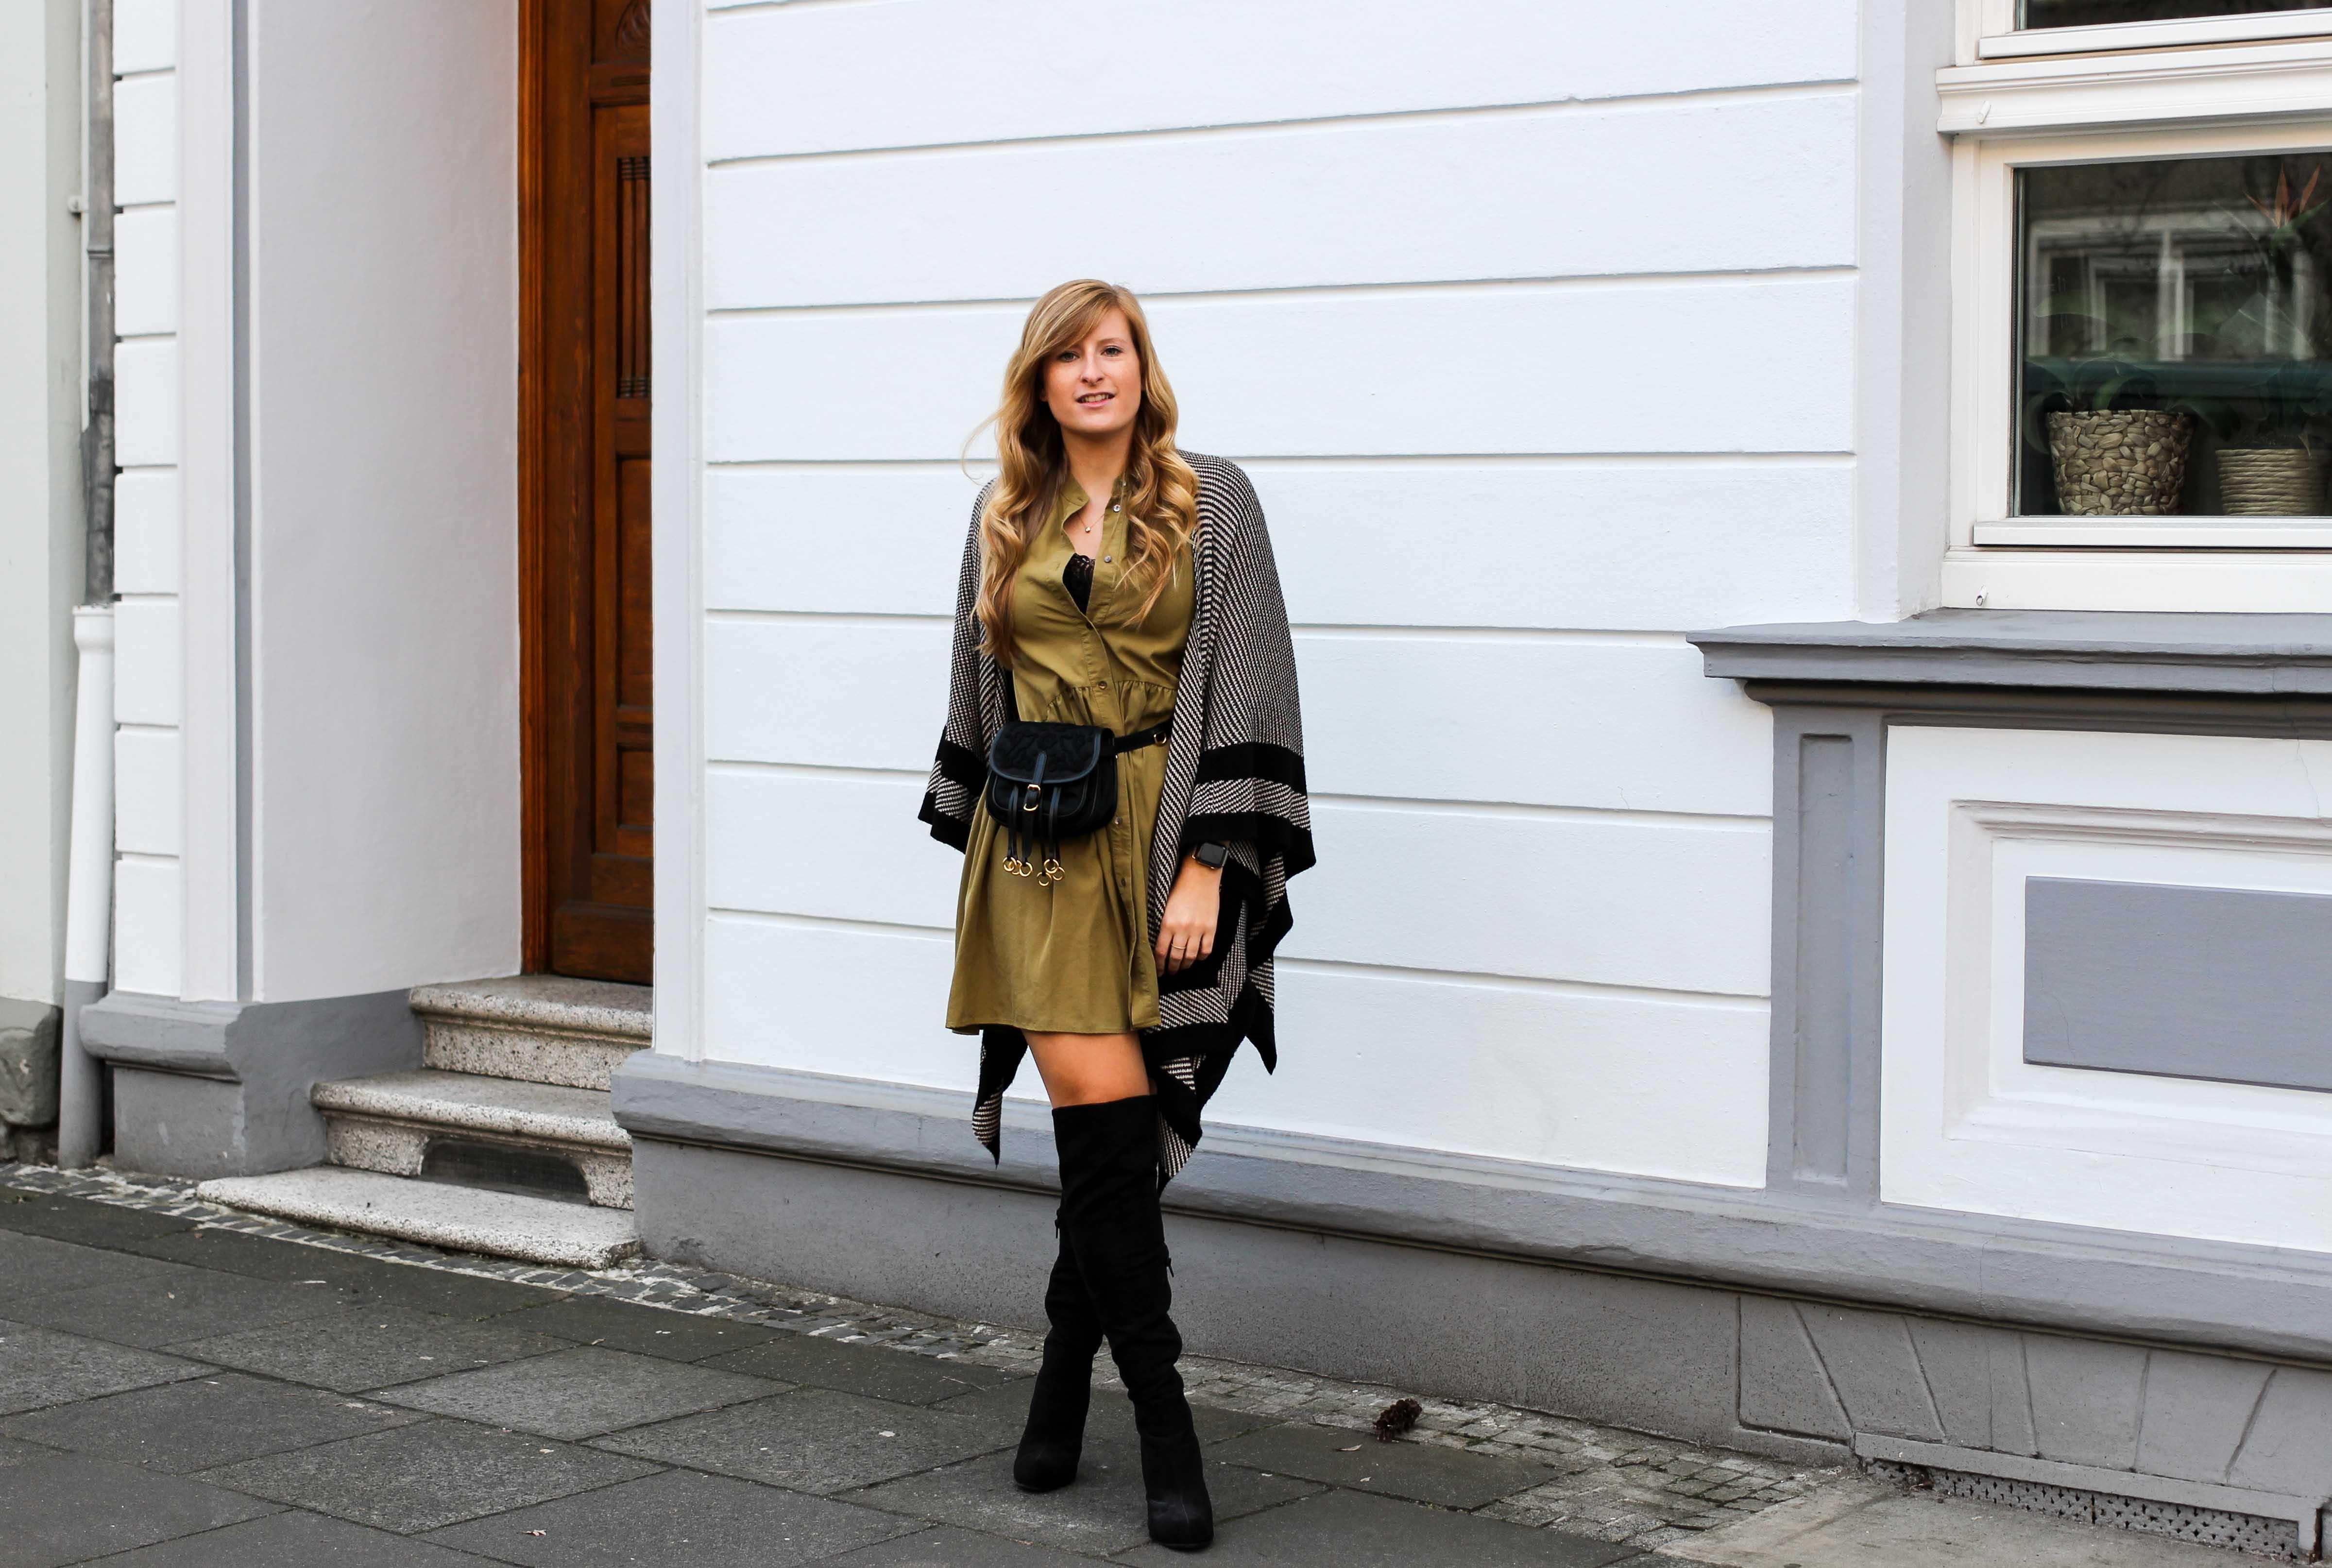 Overknees Gürteltasche Prada Poncho Second-Hand Kleidung kombinieren Streetstyle Outfit Bonn Zara Kleid grün Frühling 2019 92